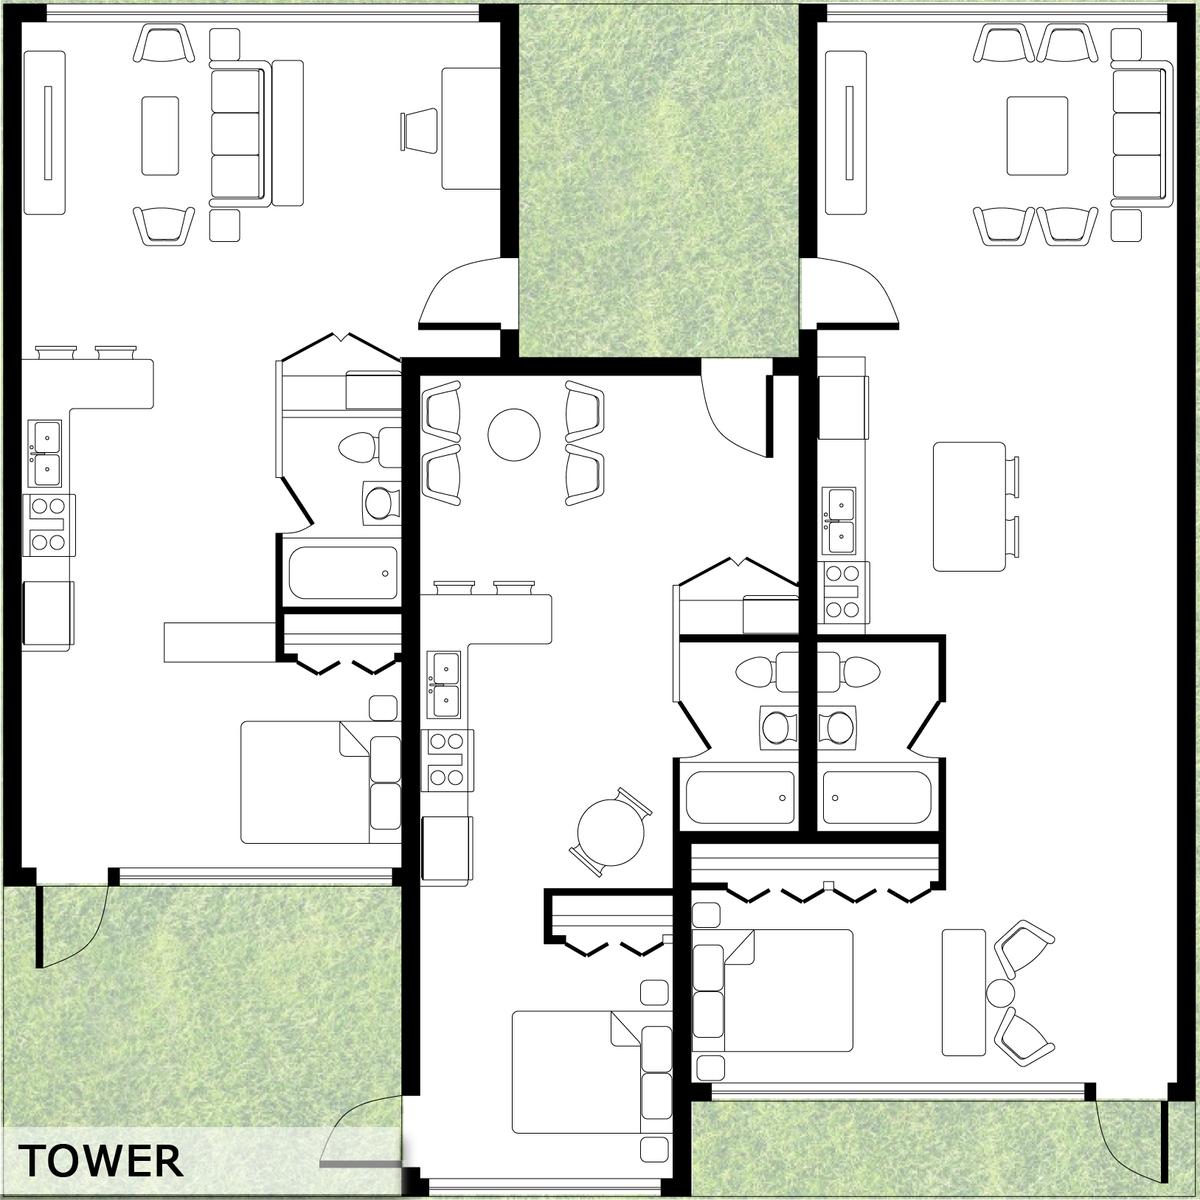 Unit Floorplan_Tower Variation